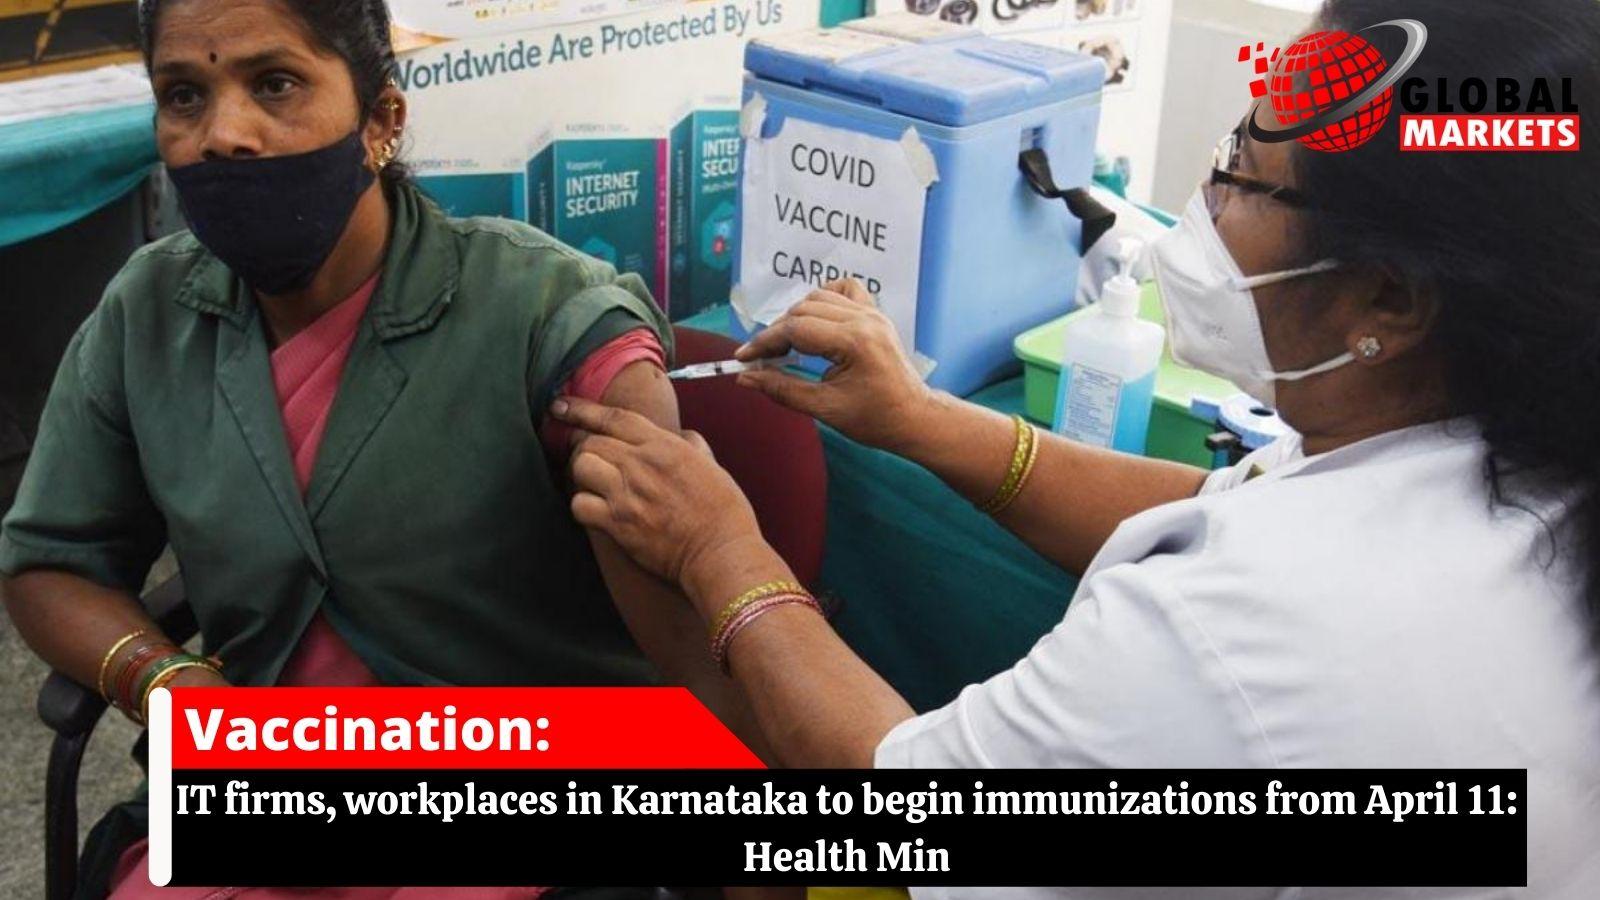 IT firms, workplaces in Karnataka to begin immunizations from April 11: Health Min